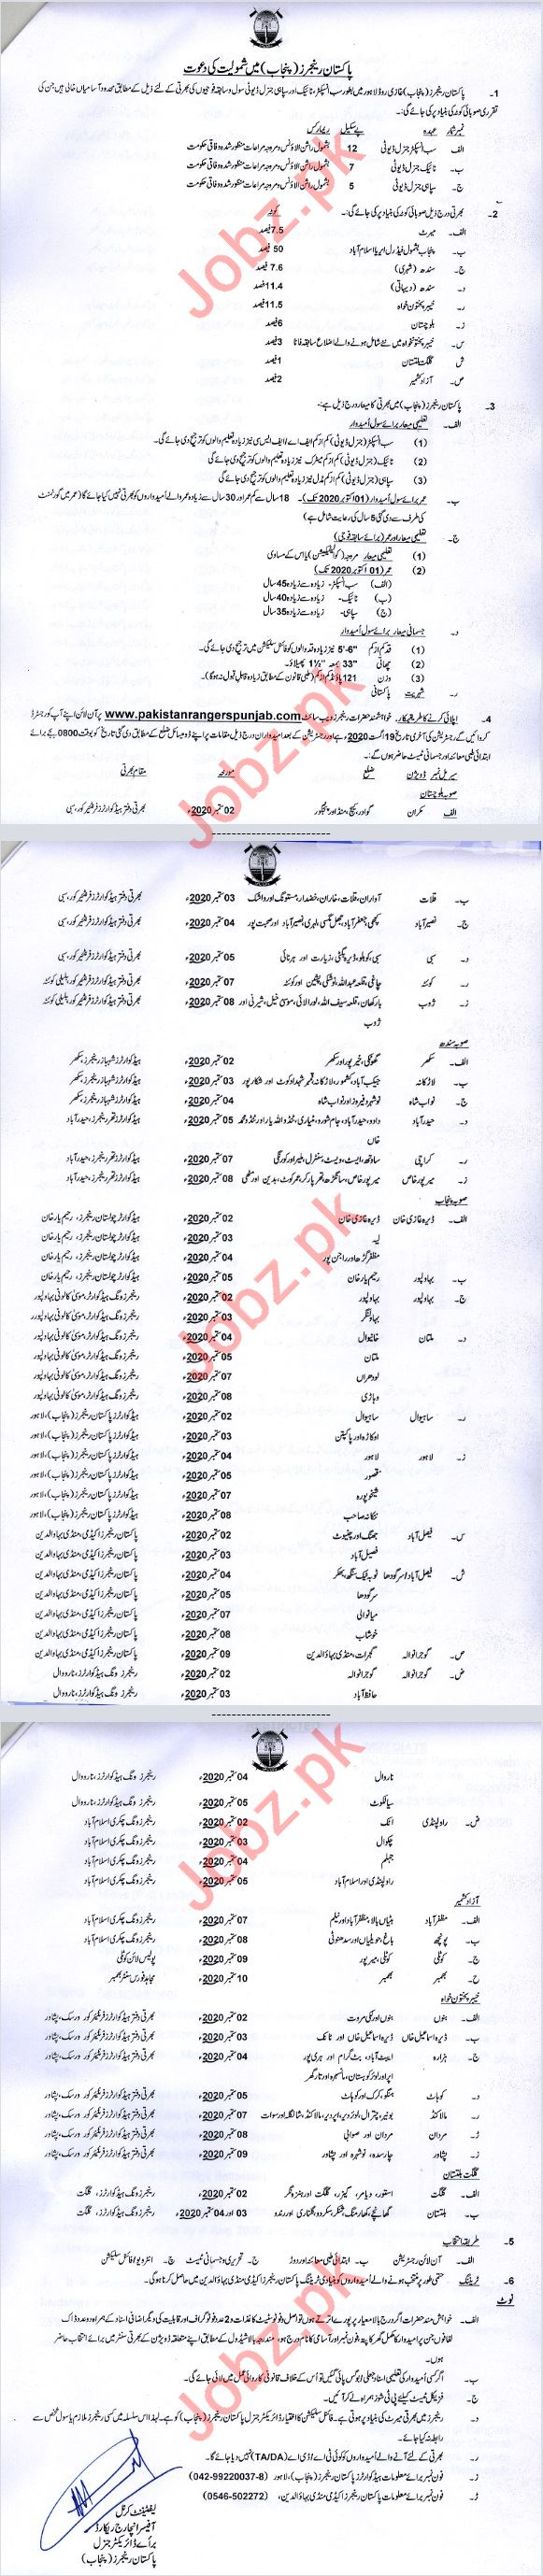 Punjab Rangers Jobs 2020 for Sub Inspector & Sepoy